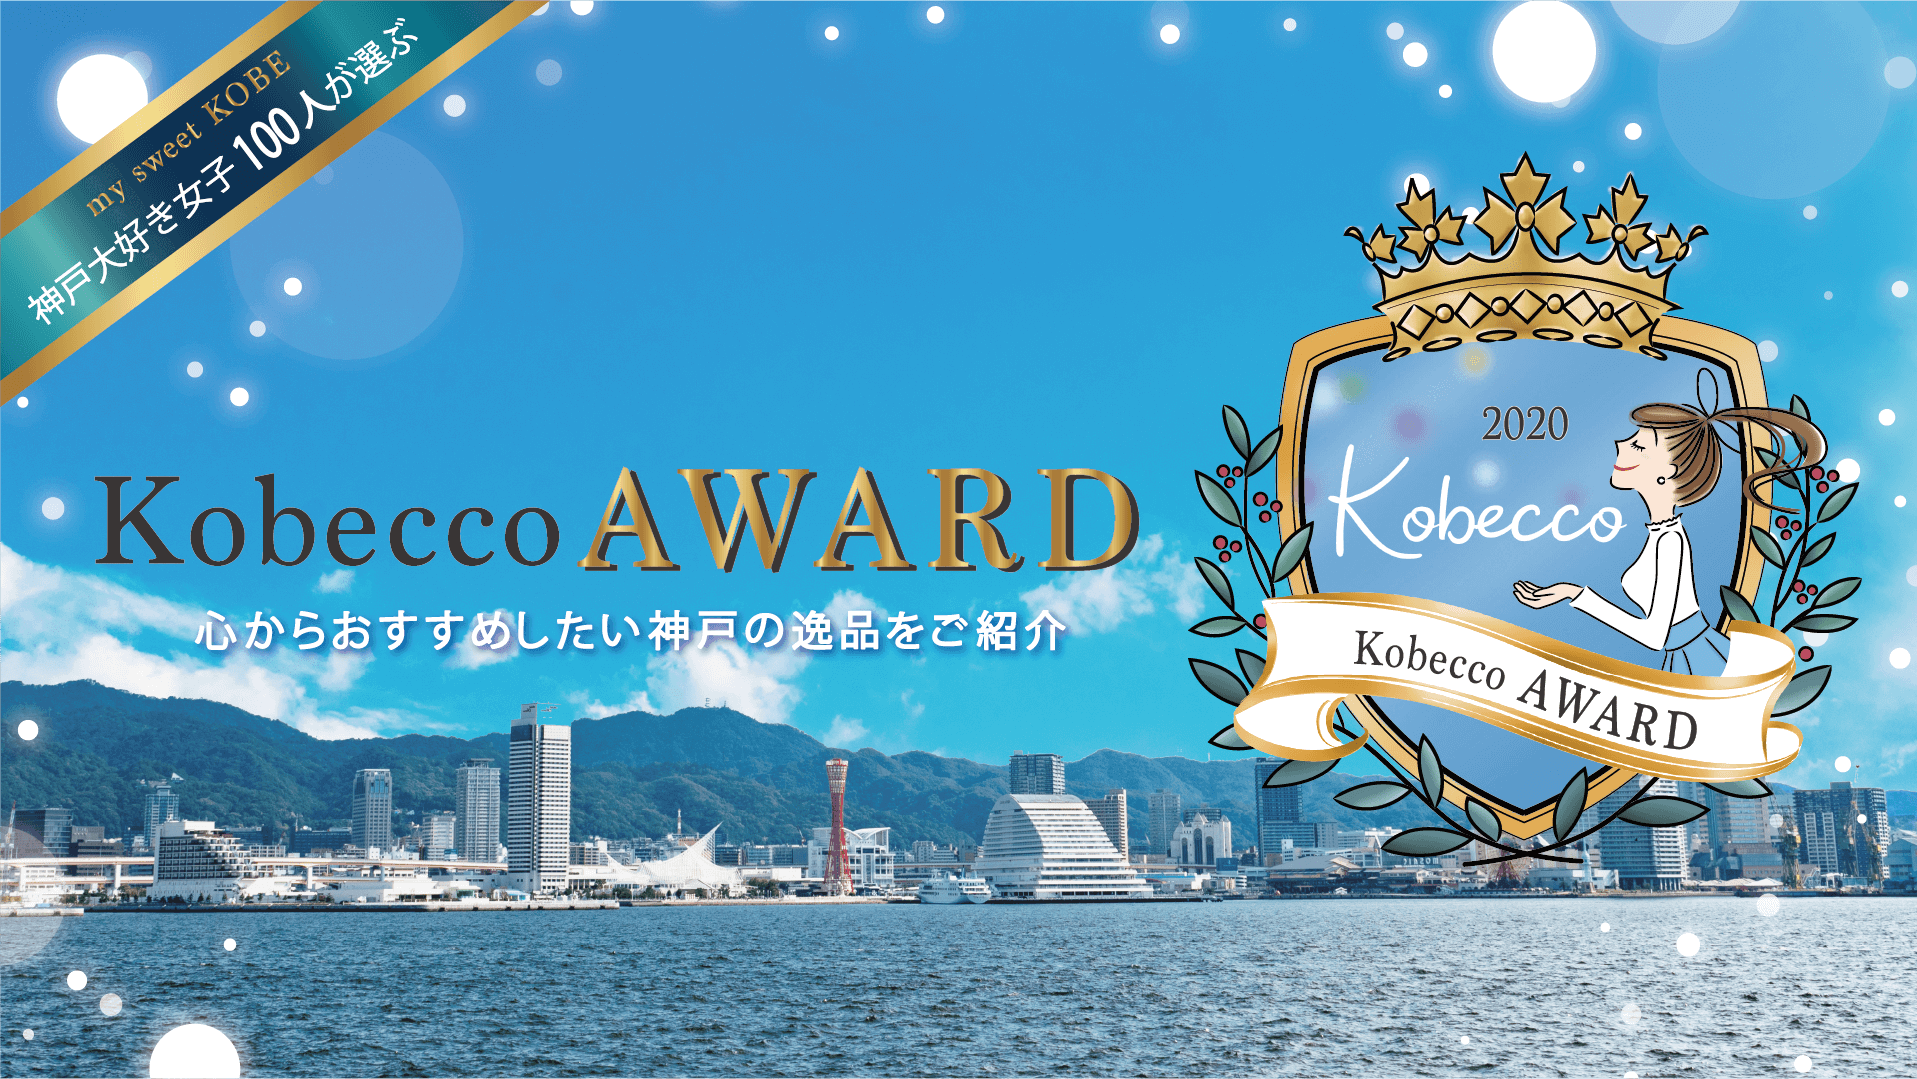 Kobecco Award 2020